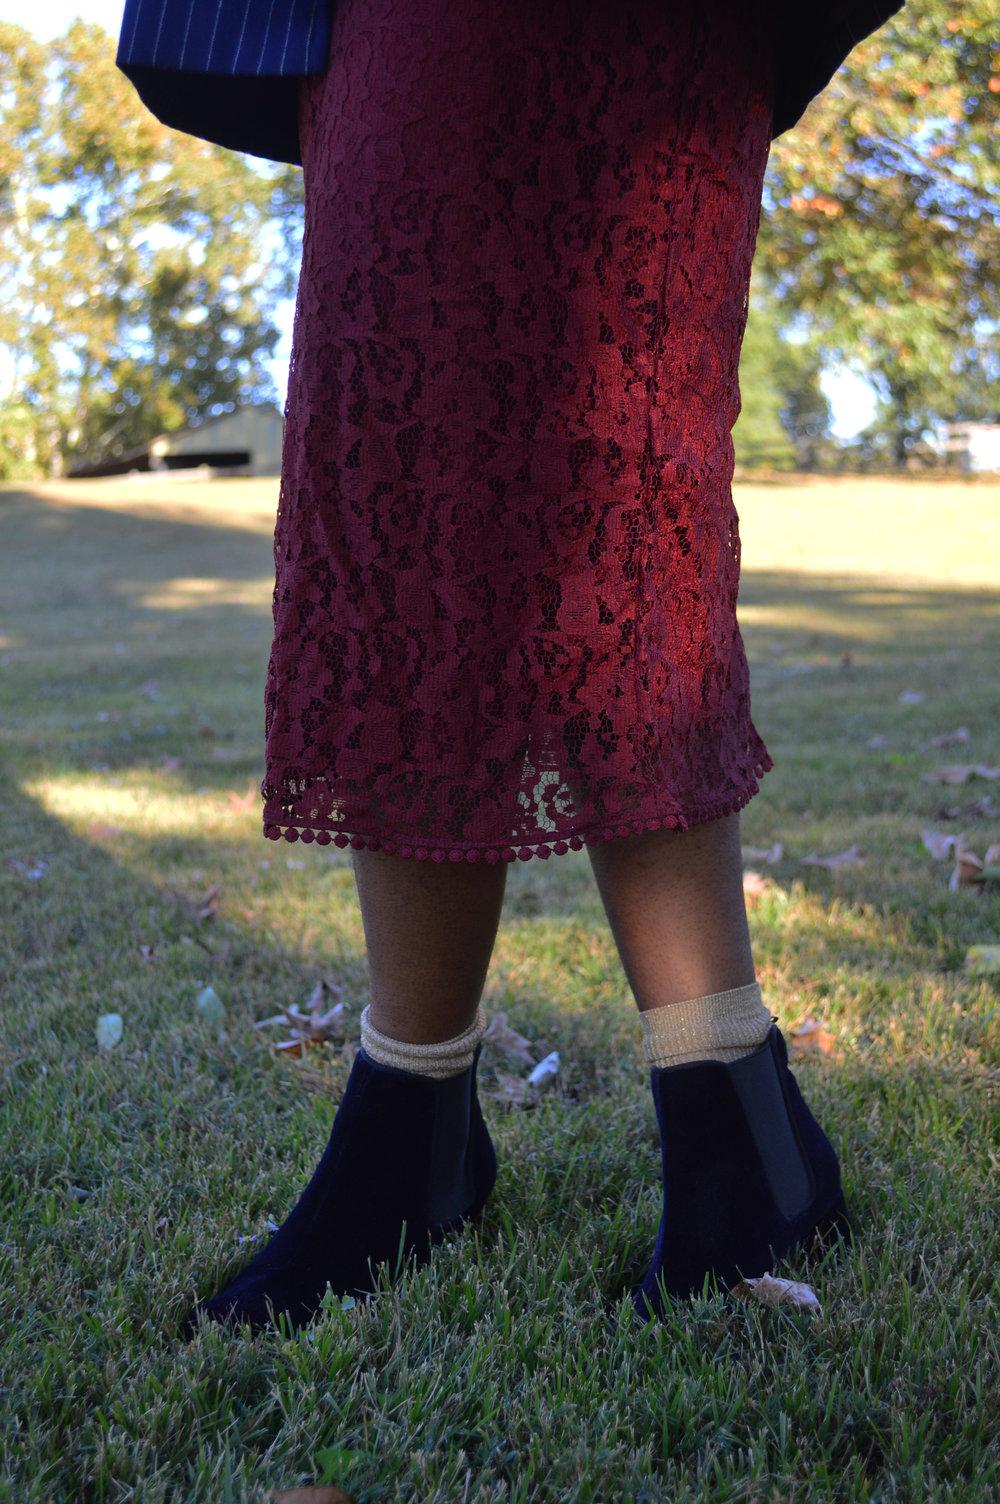 h-and-m-burgundy-skirt.jpg